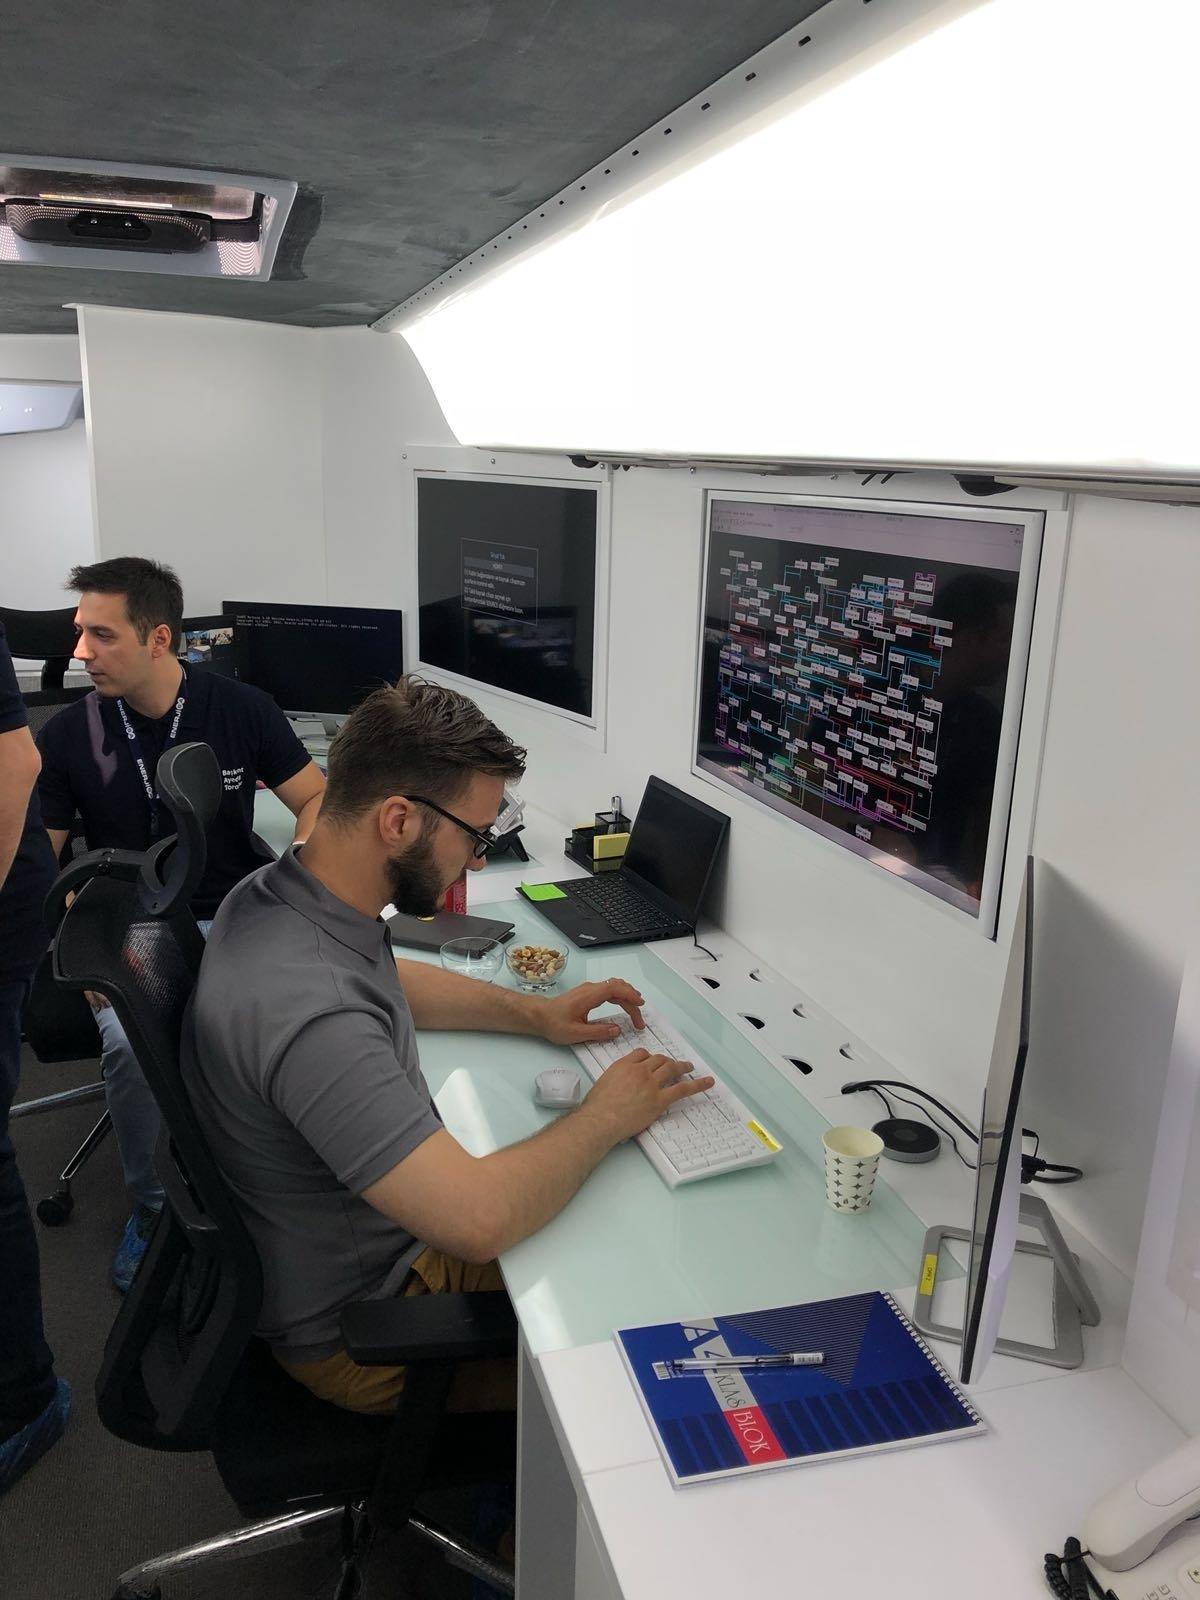 Employees work in front of a mobile SCADA system developed by Enerjisa engineers on Dec. 3, 2020. (Photo by Enerjisa via AA)